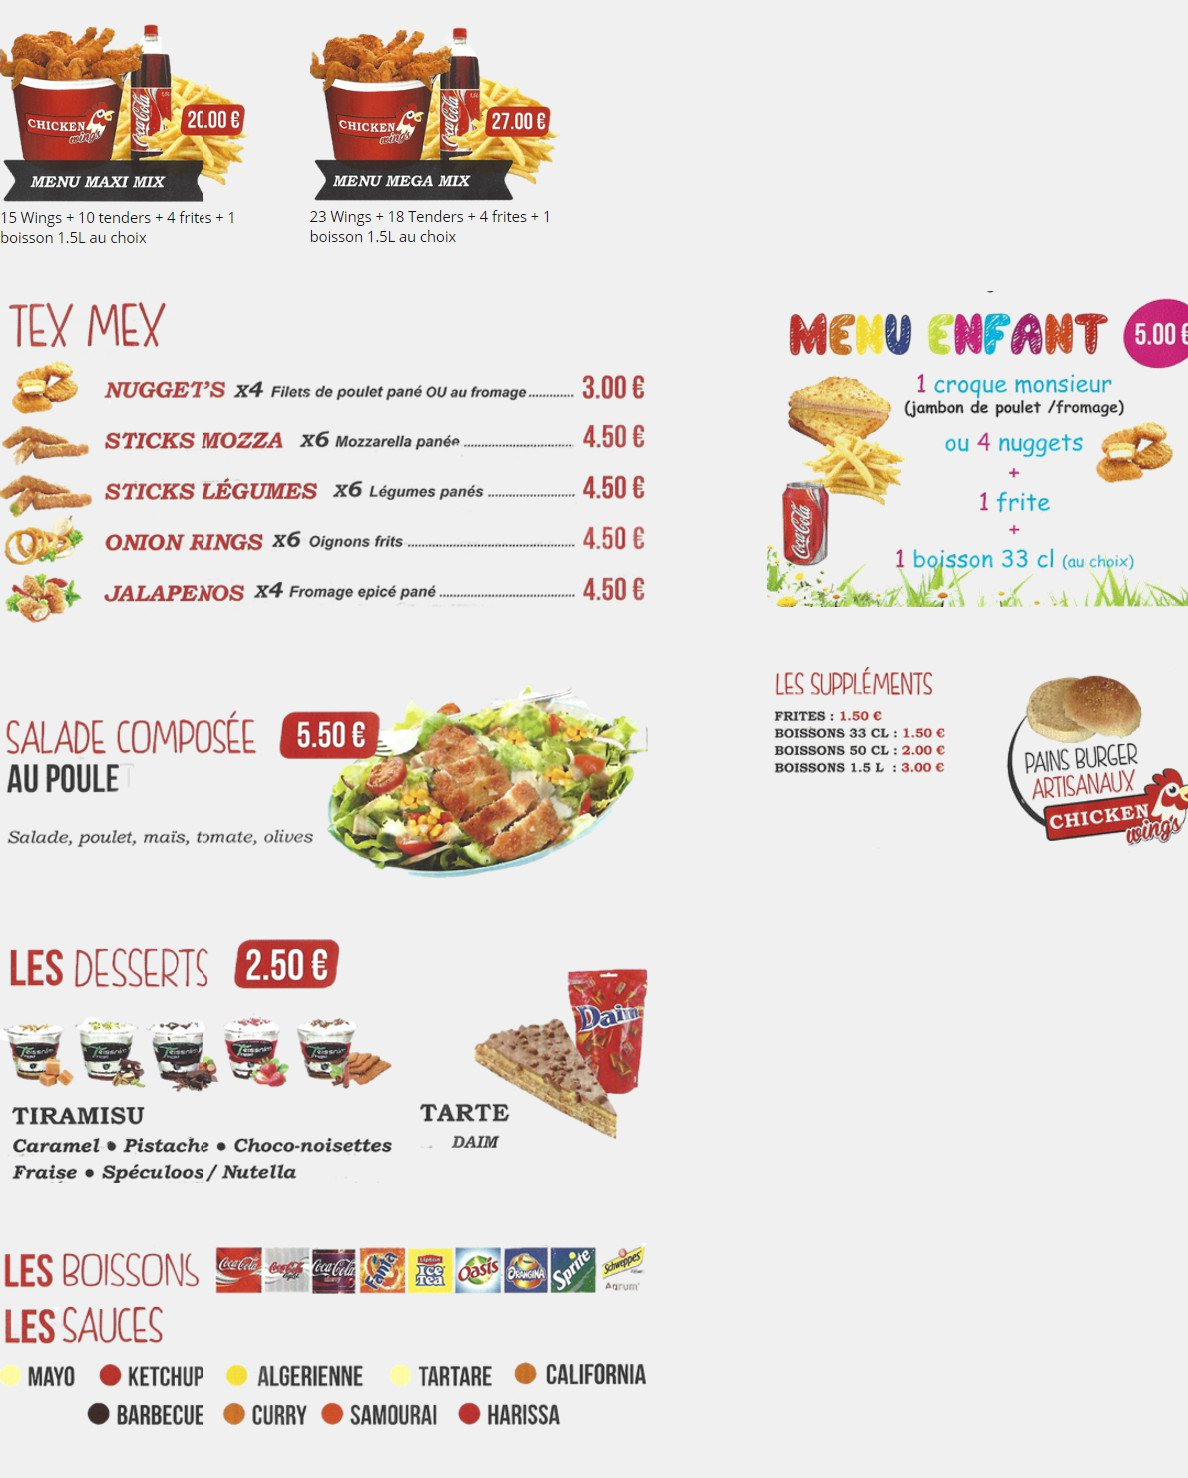 Dominos Pizza Besancon. Amazing Nachos Mexican Grill Besanon France ...